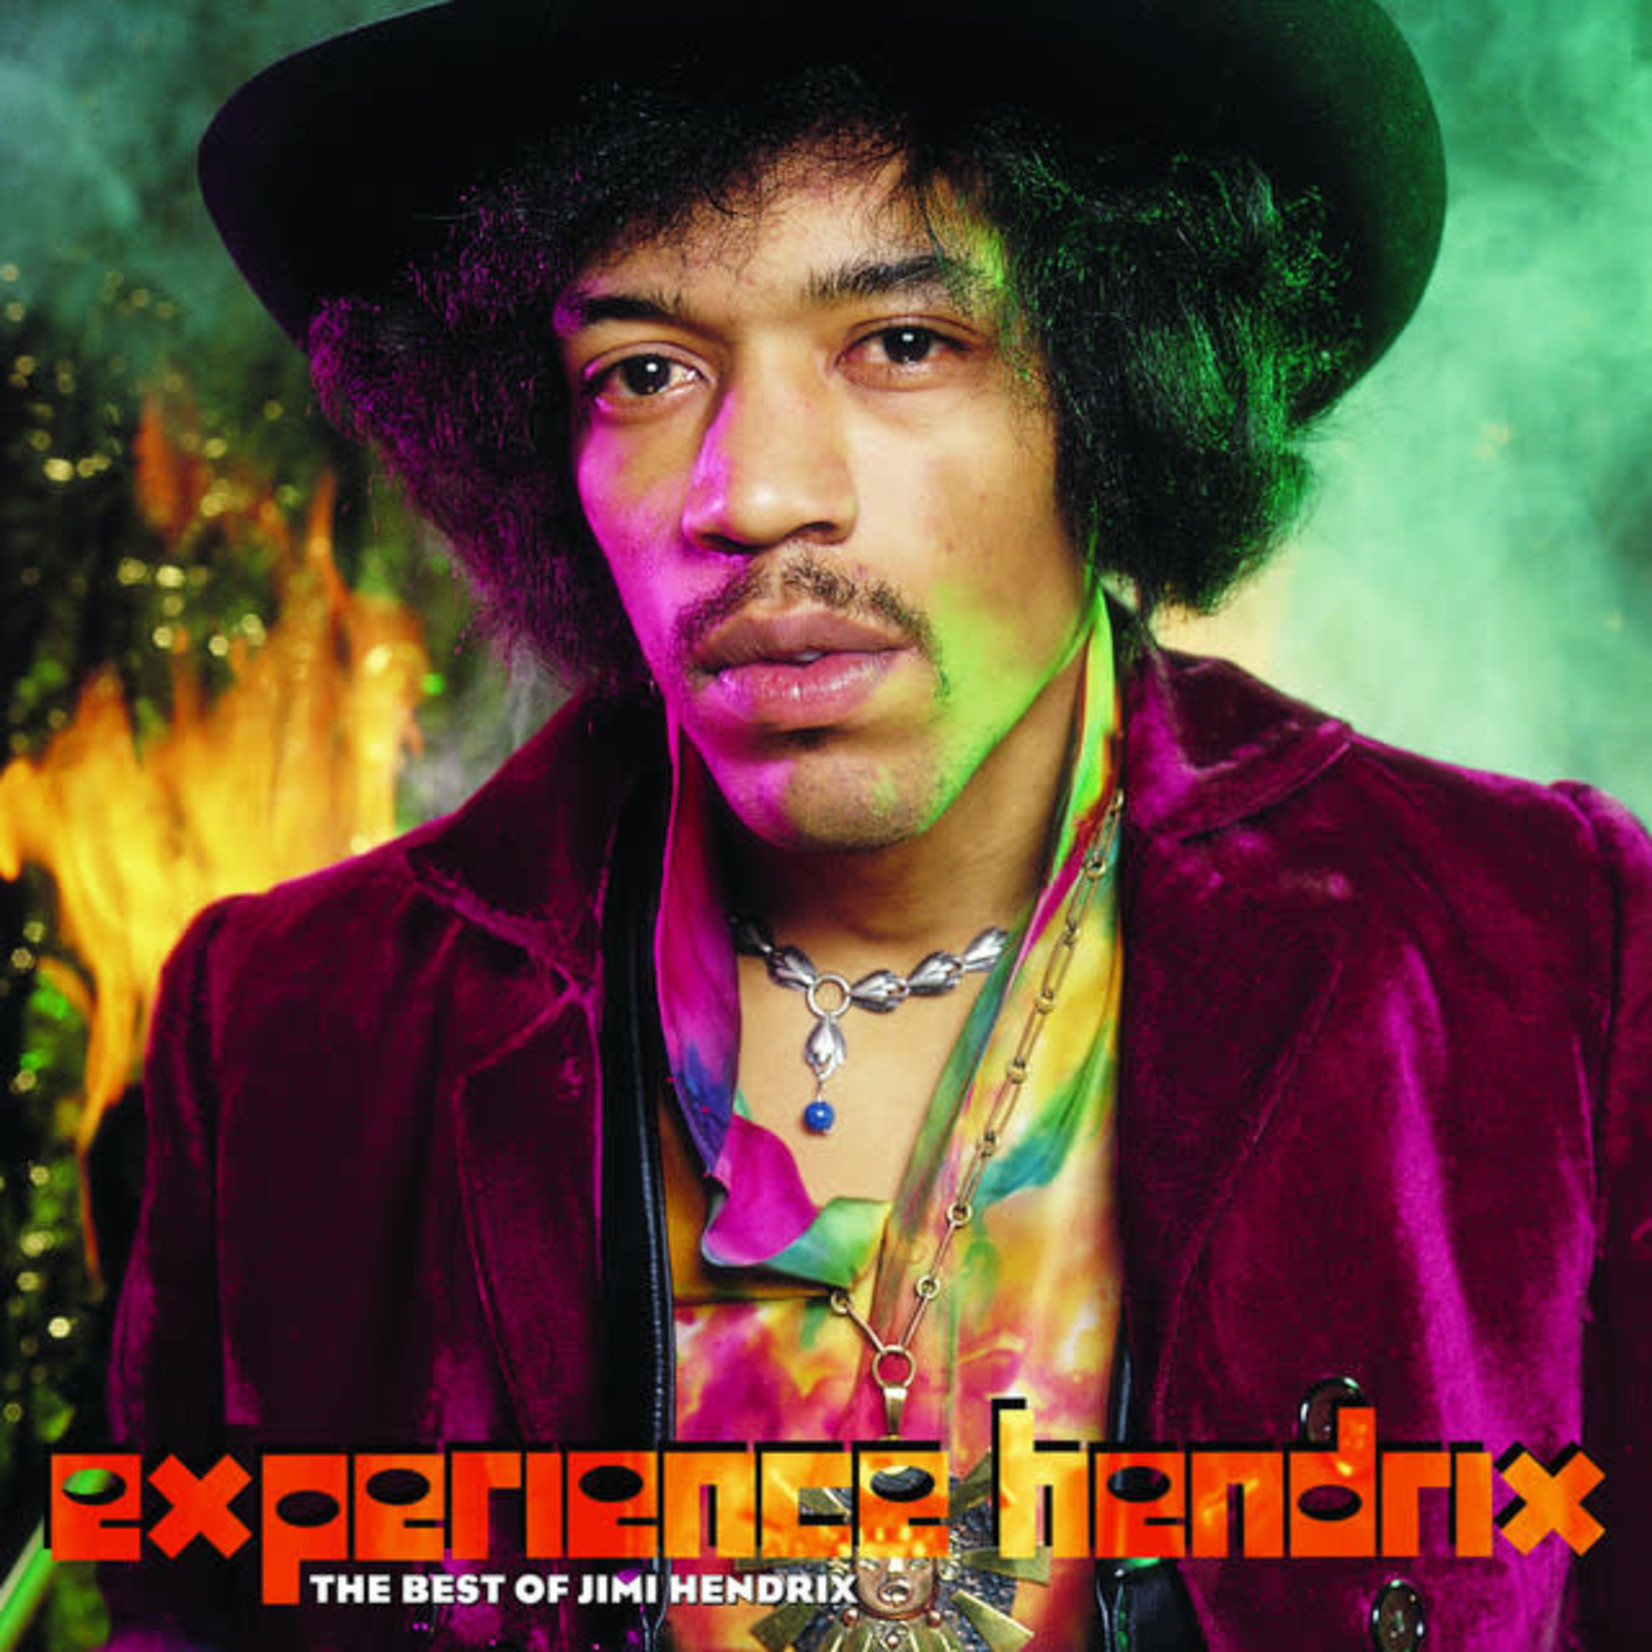 Vinyl Jimi Hendrix - Experience Hendrix (The Best of Jimi Hendrix)